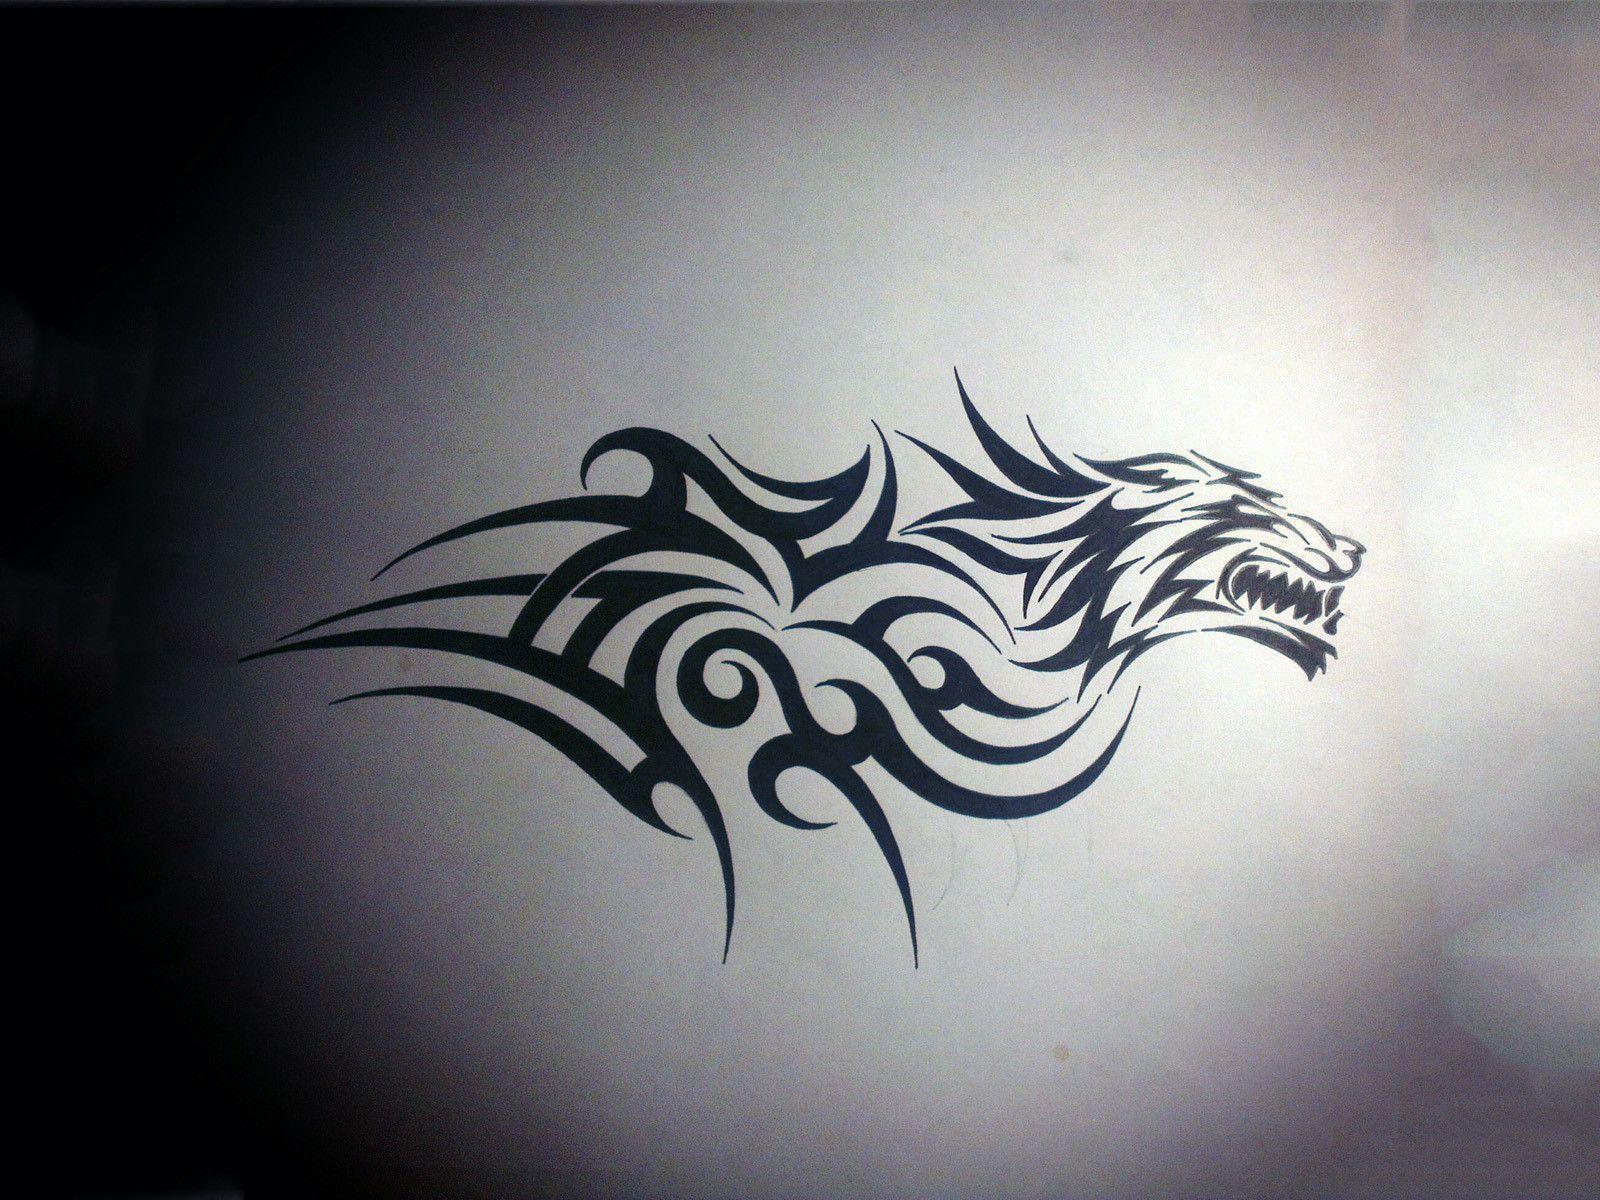 tribal tiger designs - HD1600×1200